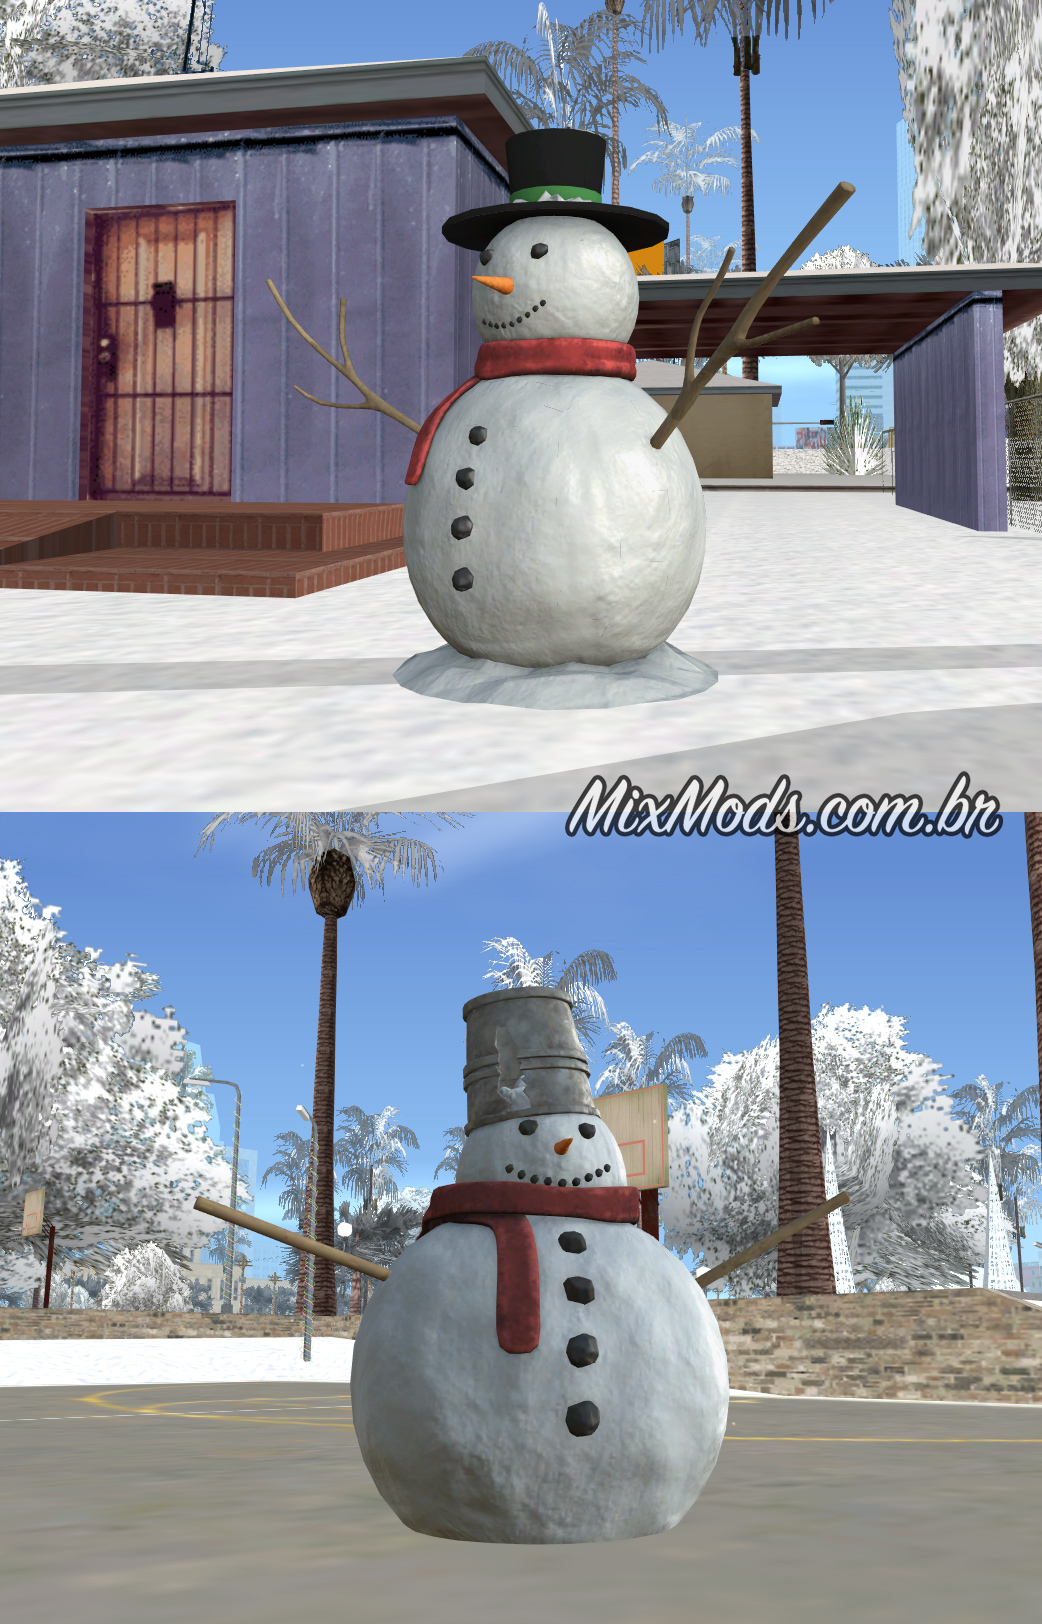 gta-sa-mod-snowman-snowmen-snow-boneco-n